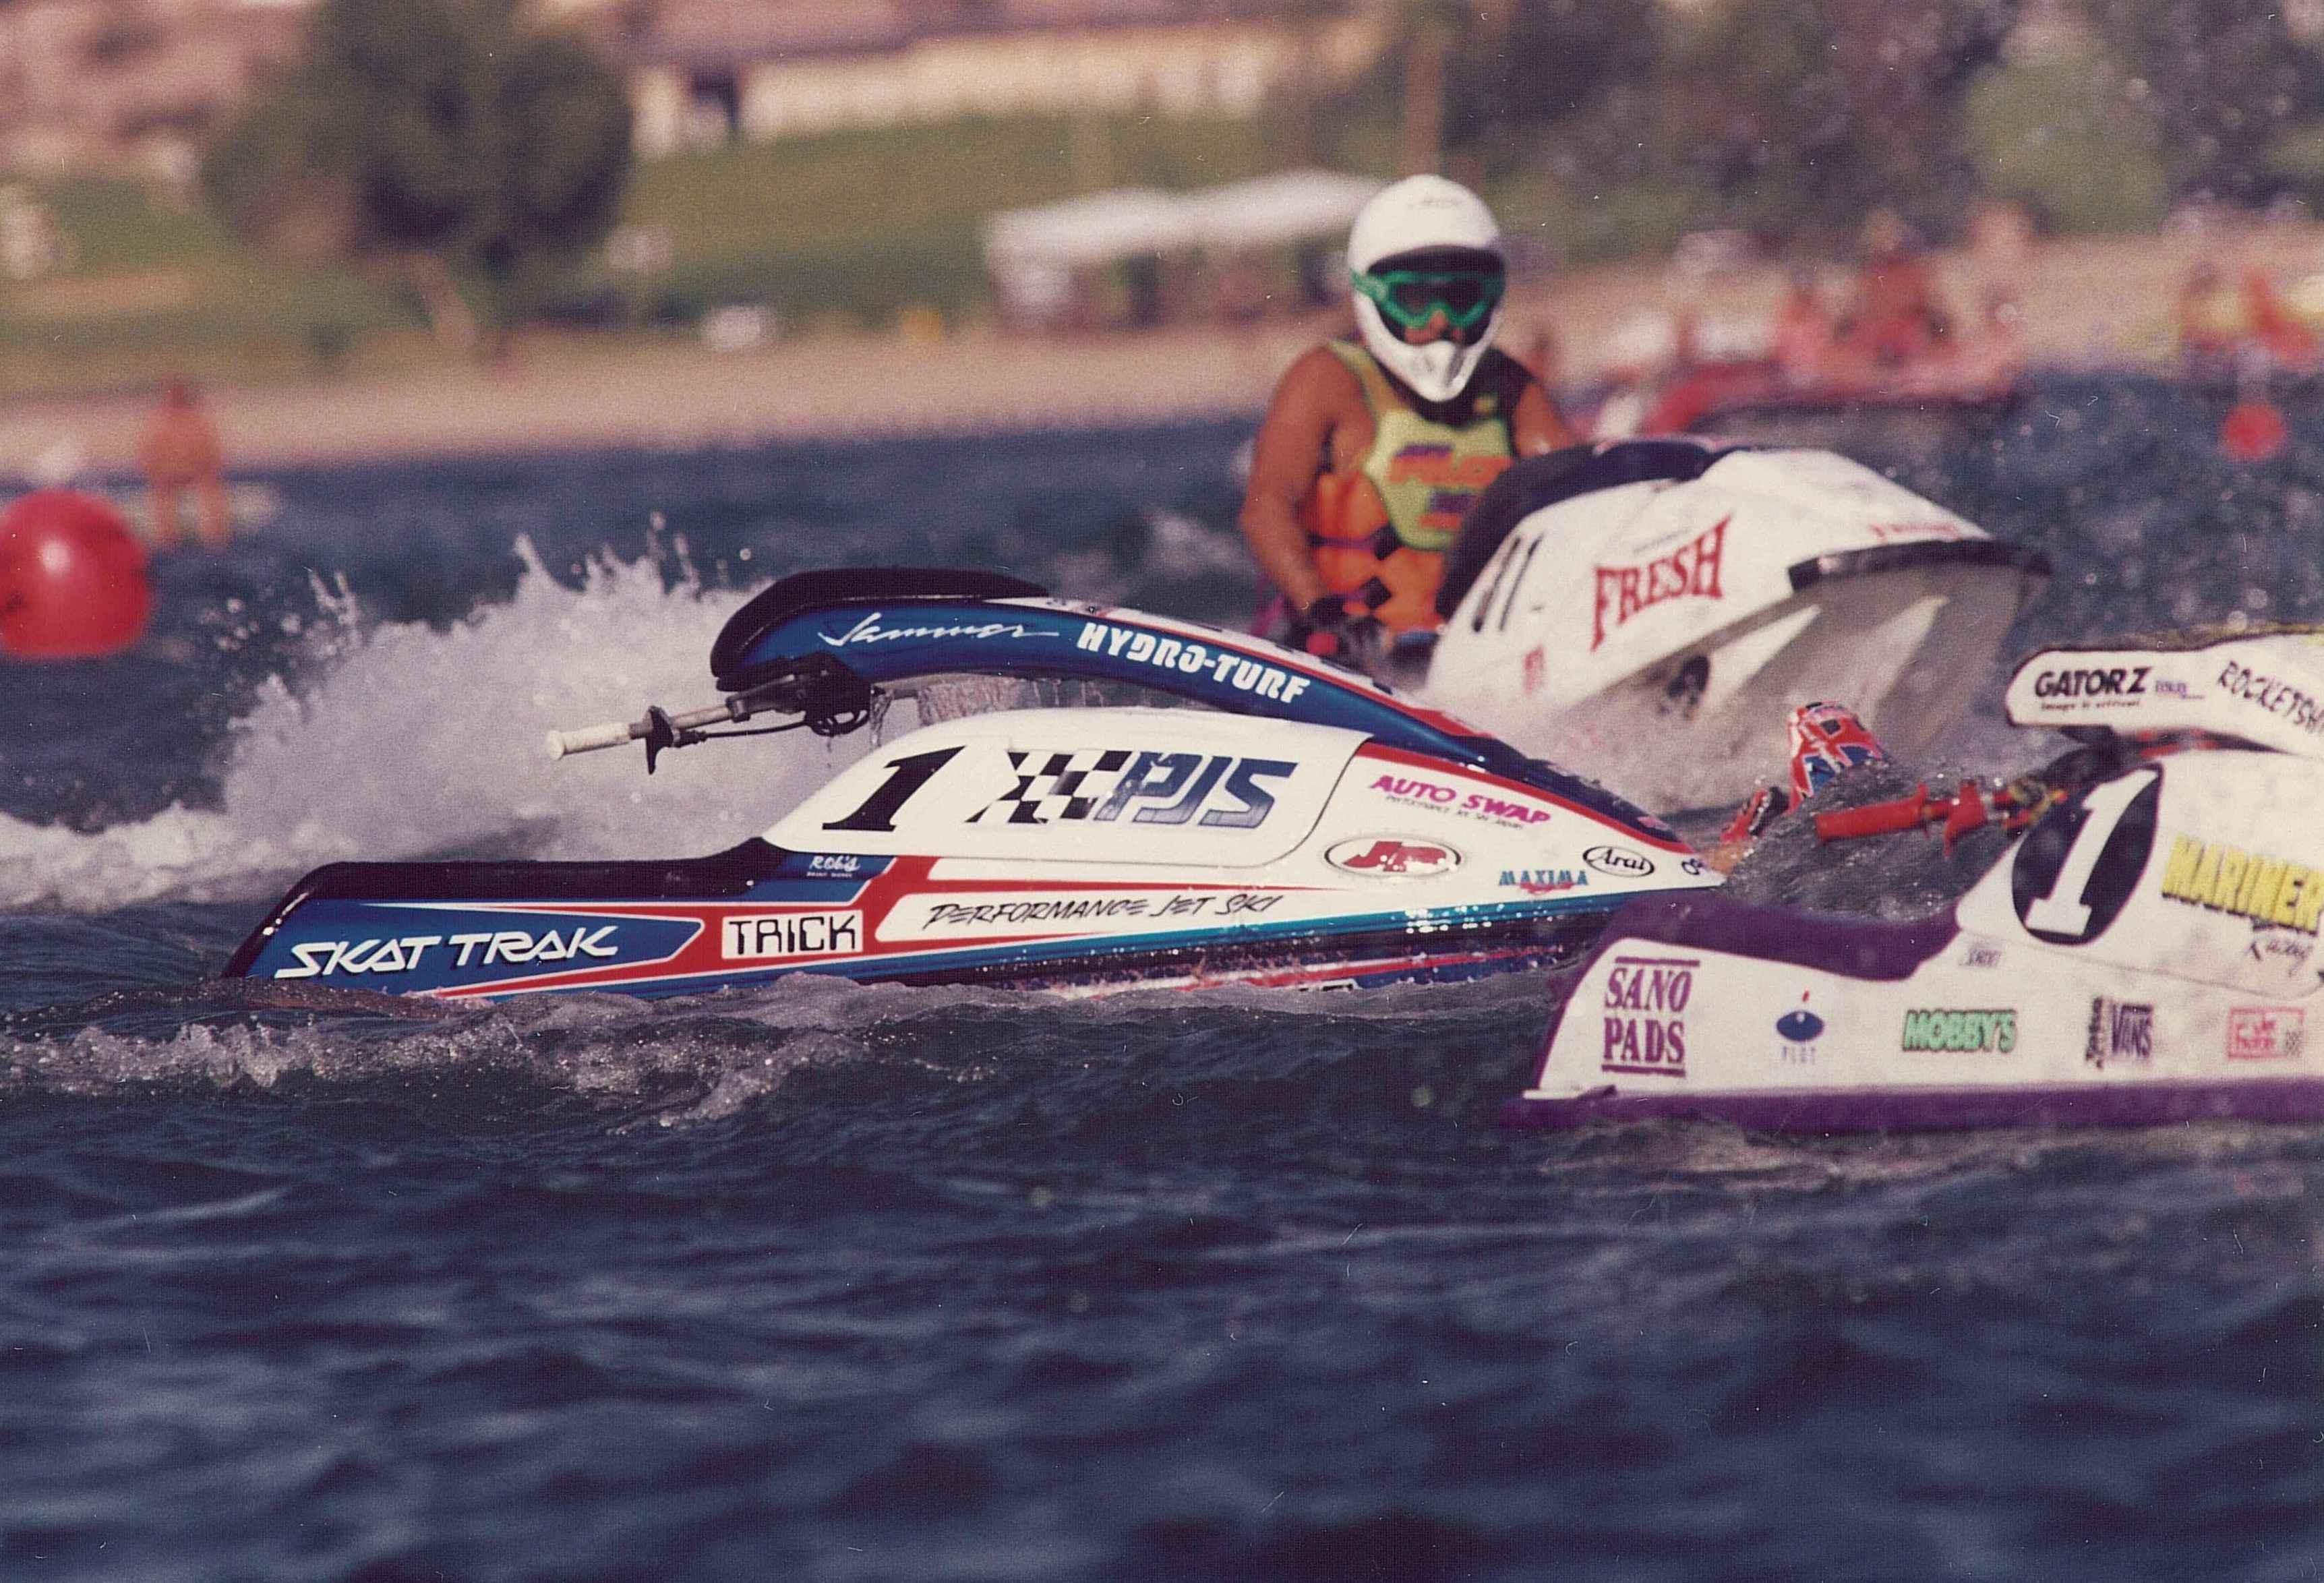 SPOTLIGHT Jeff Jacobs – MOTOR ACTION MEDIA